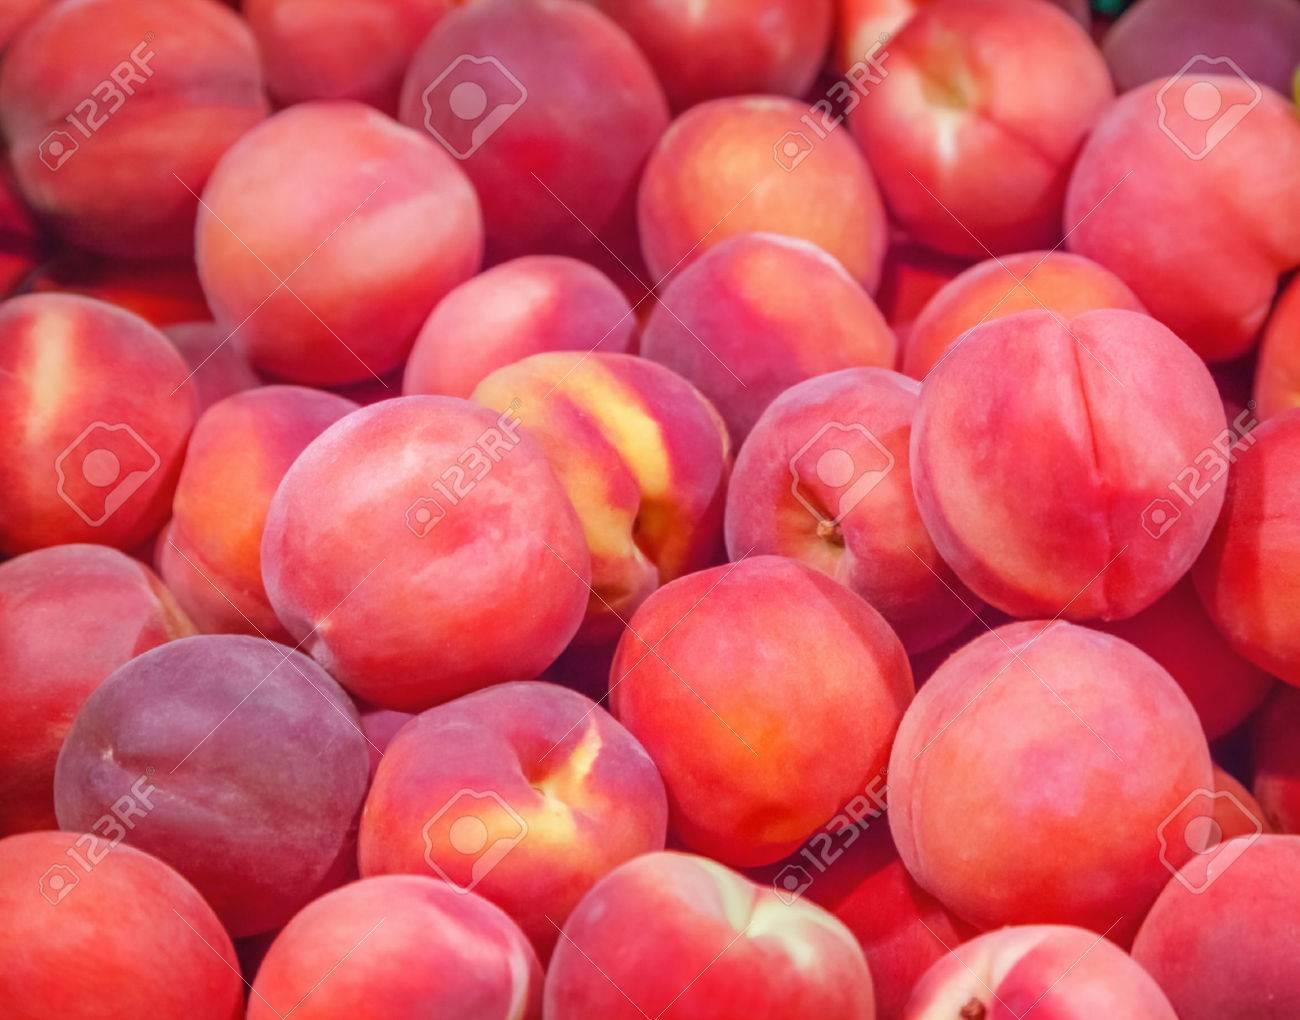 Peaches - 45929922